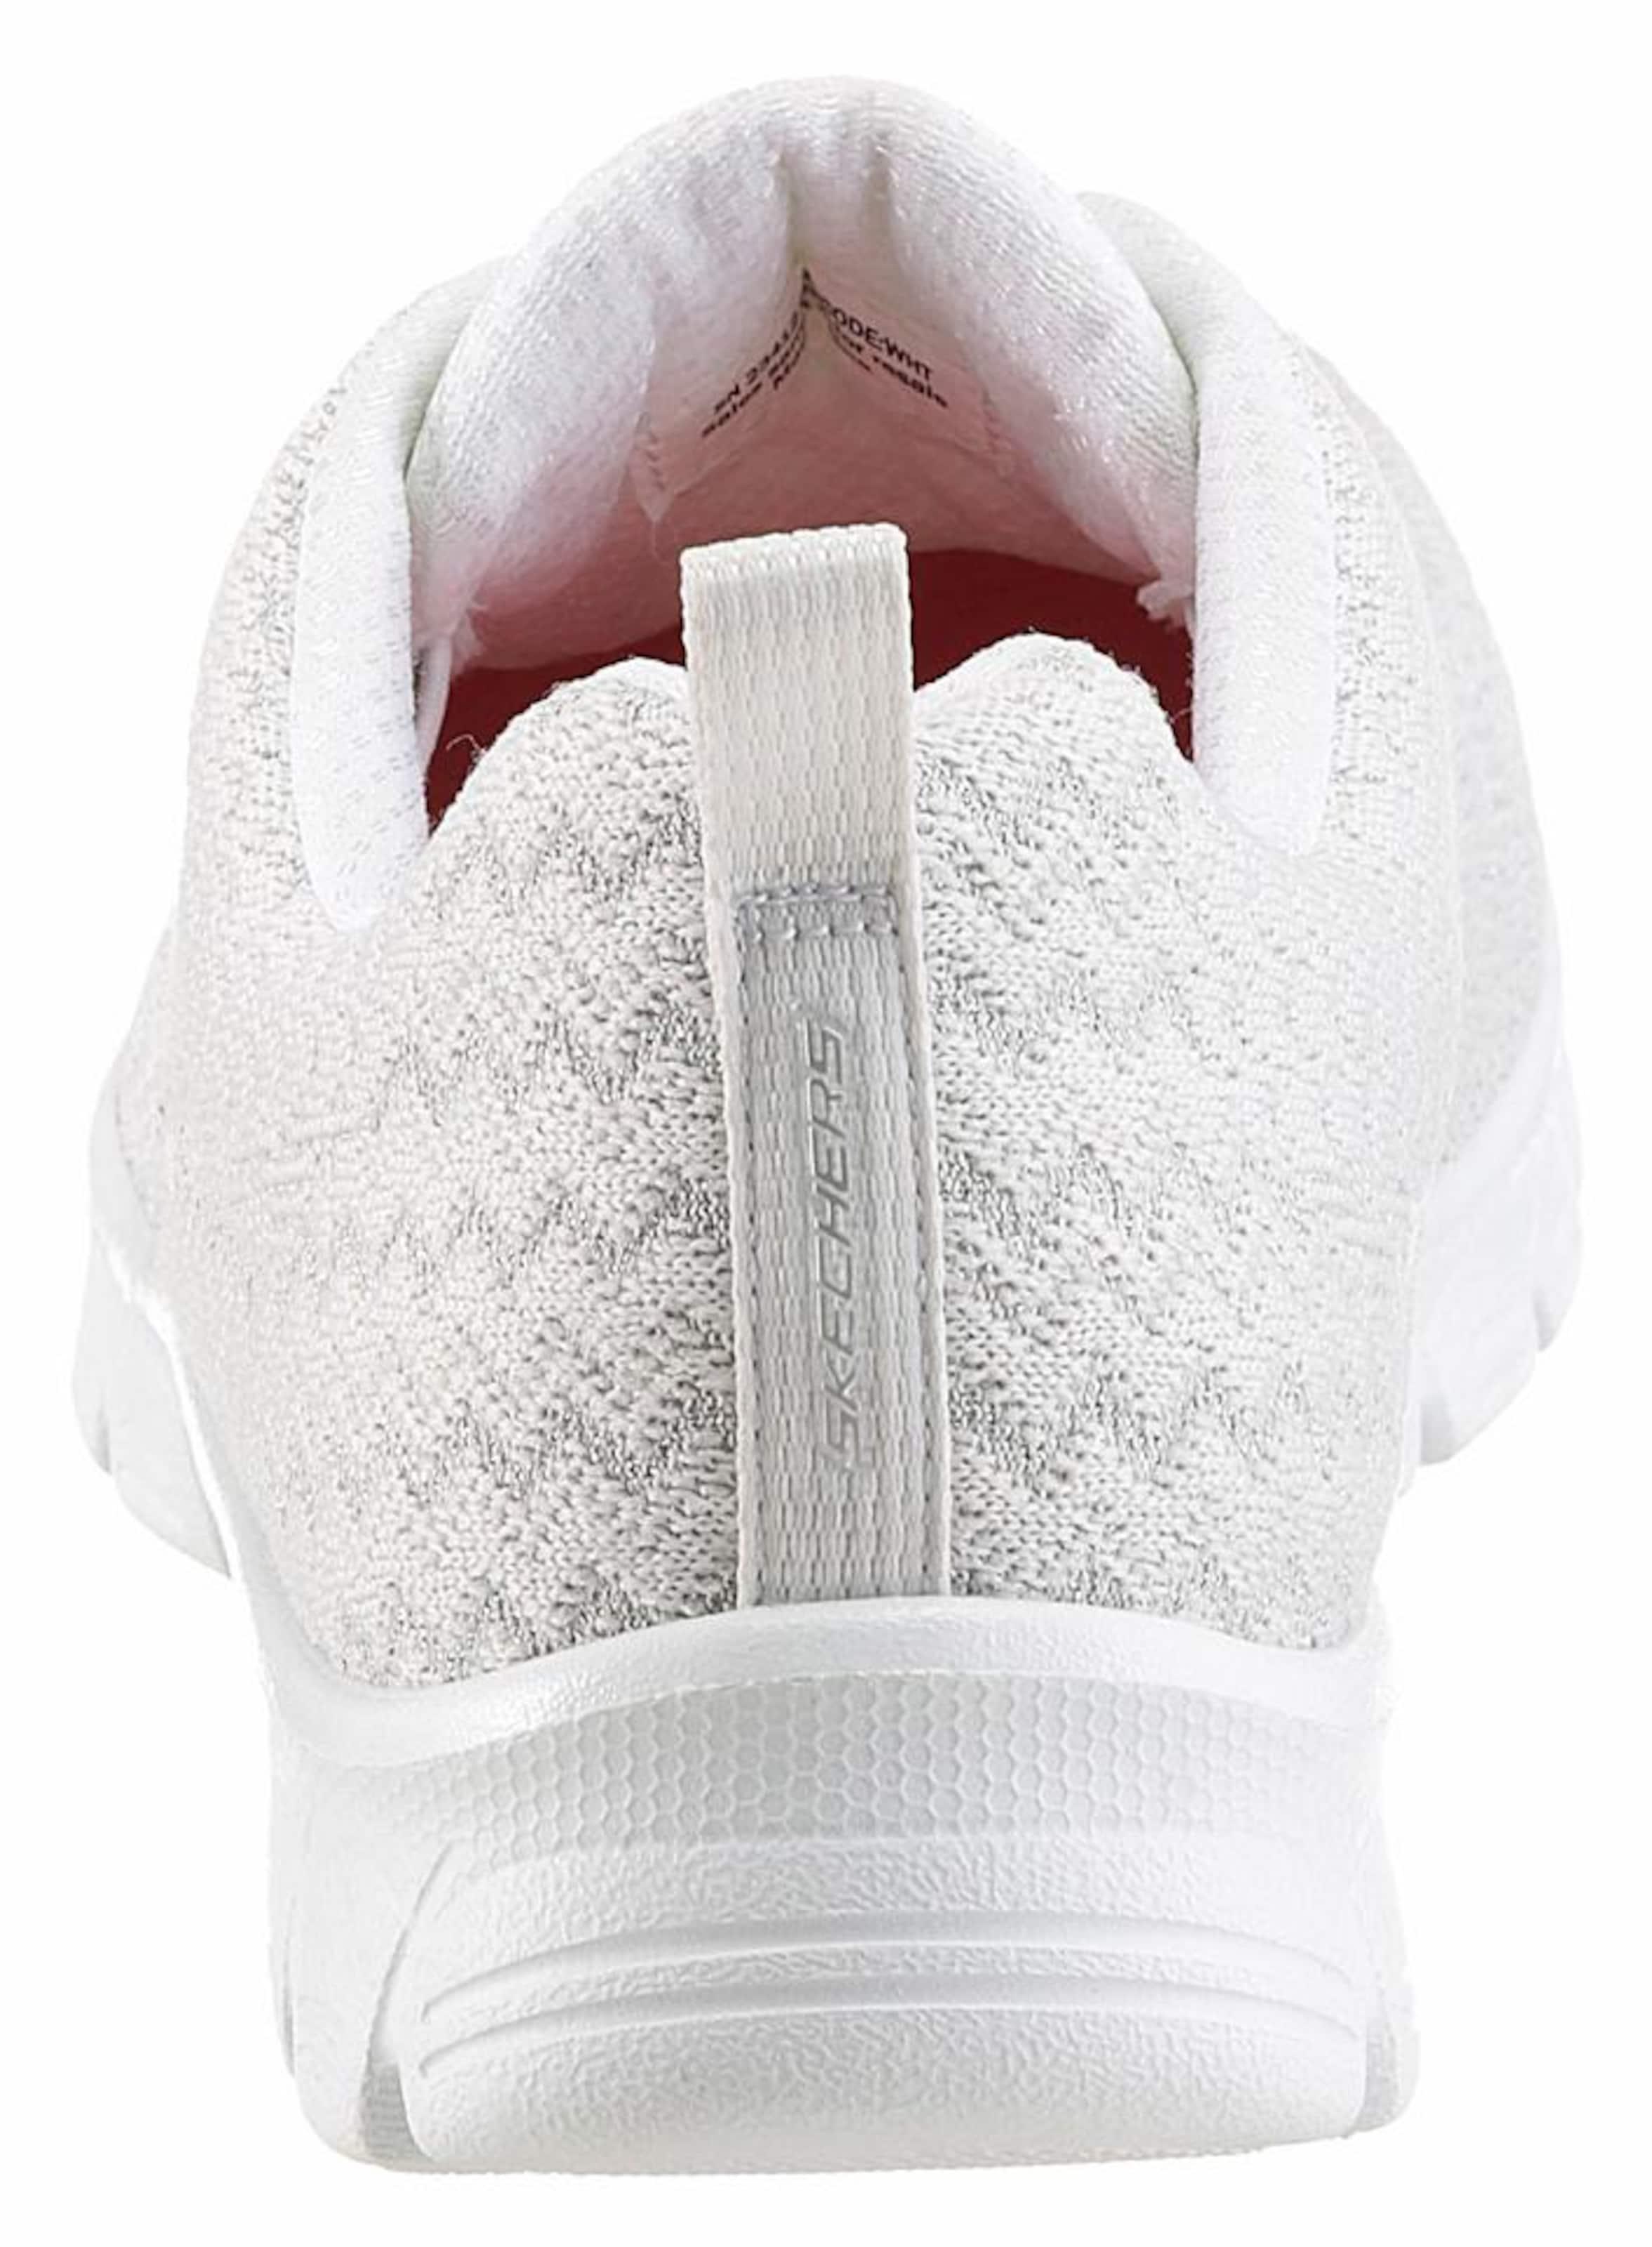 Sneaker Sneaker Sneaker Skechers In In Skechers Skechers Weiß Weiß In Skechers Weiß 9EIWHD2